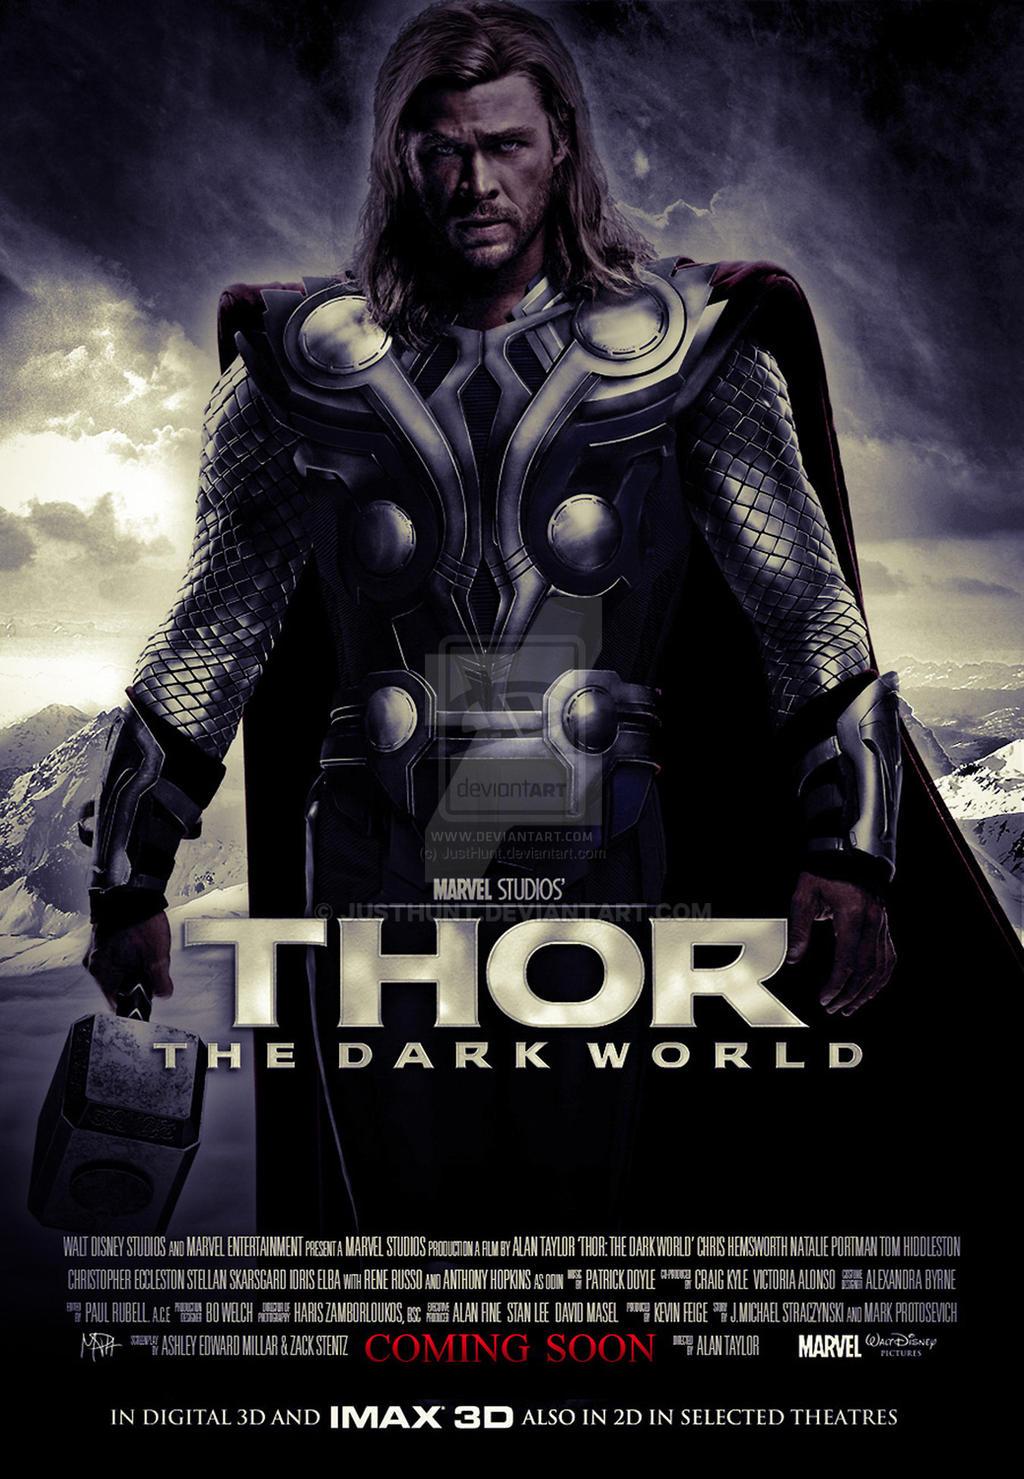 thor the dark world movie poster by justhunt on deviantart